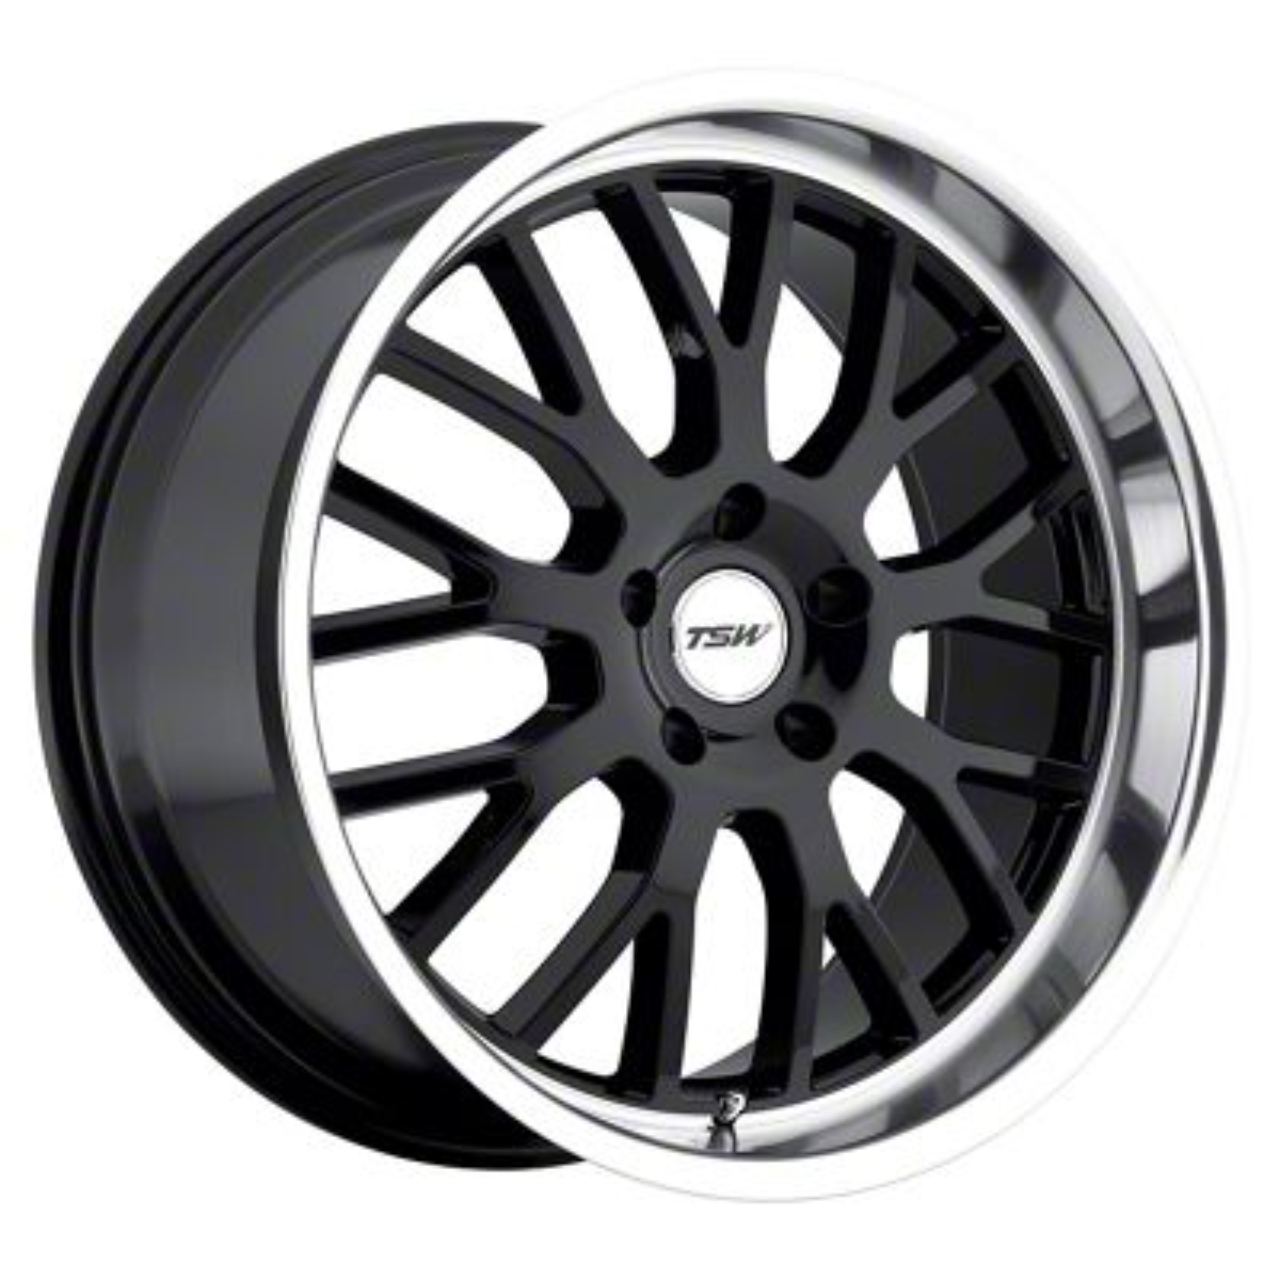 TSW Tremblant Gloss Black w/ Mirror Cut Lip Wheel - 19x9.5 (05-14 All)